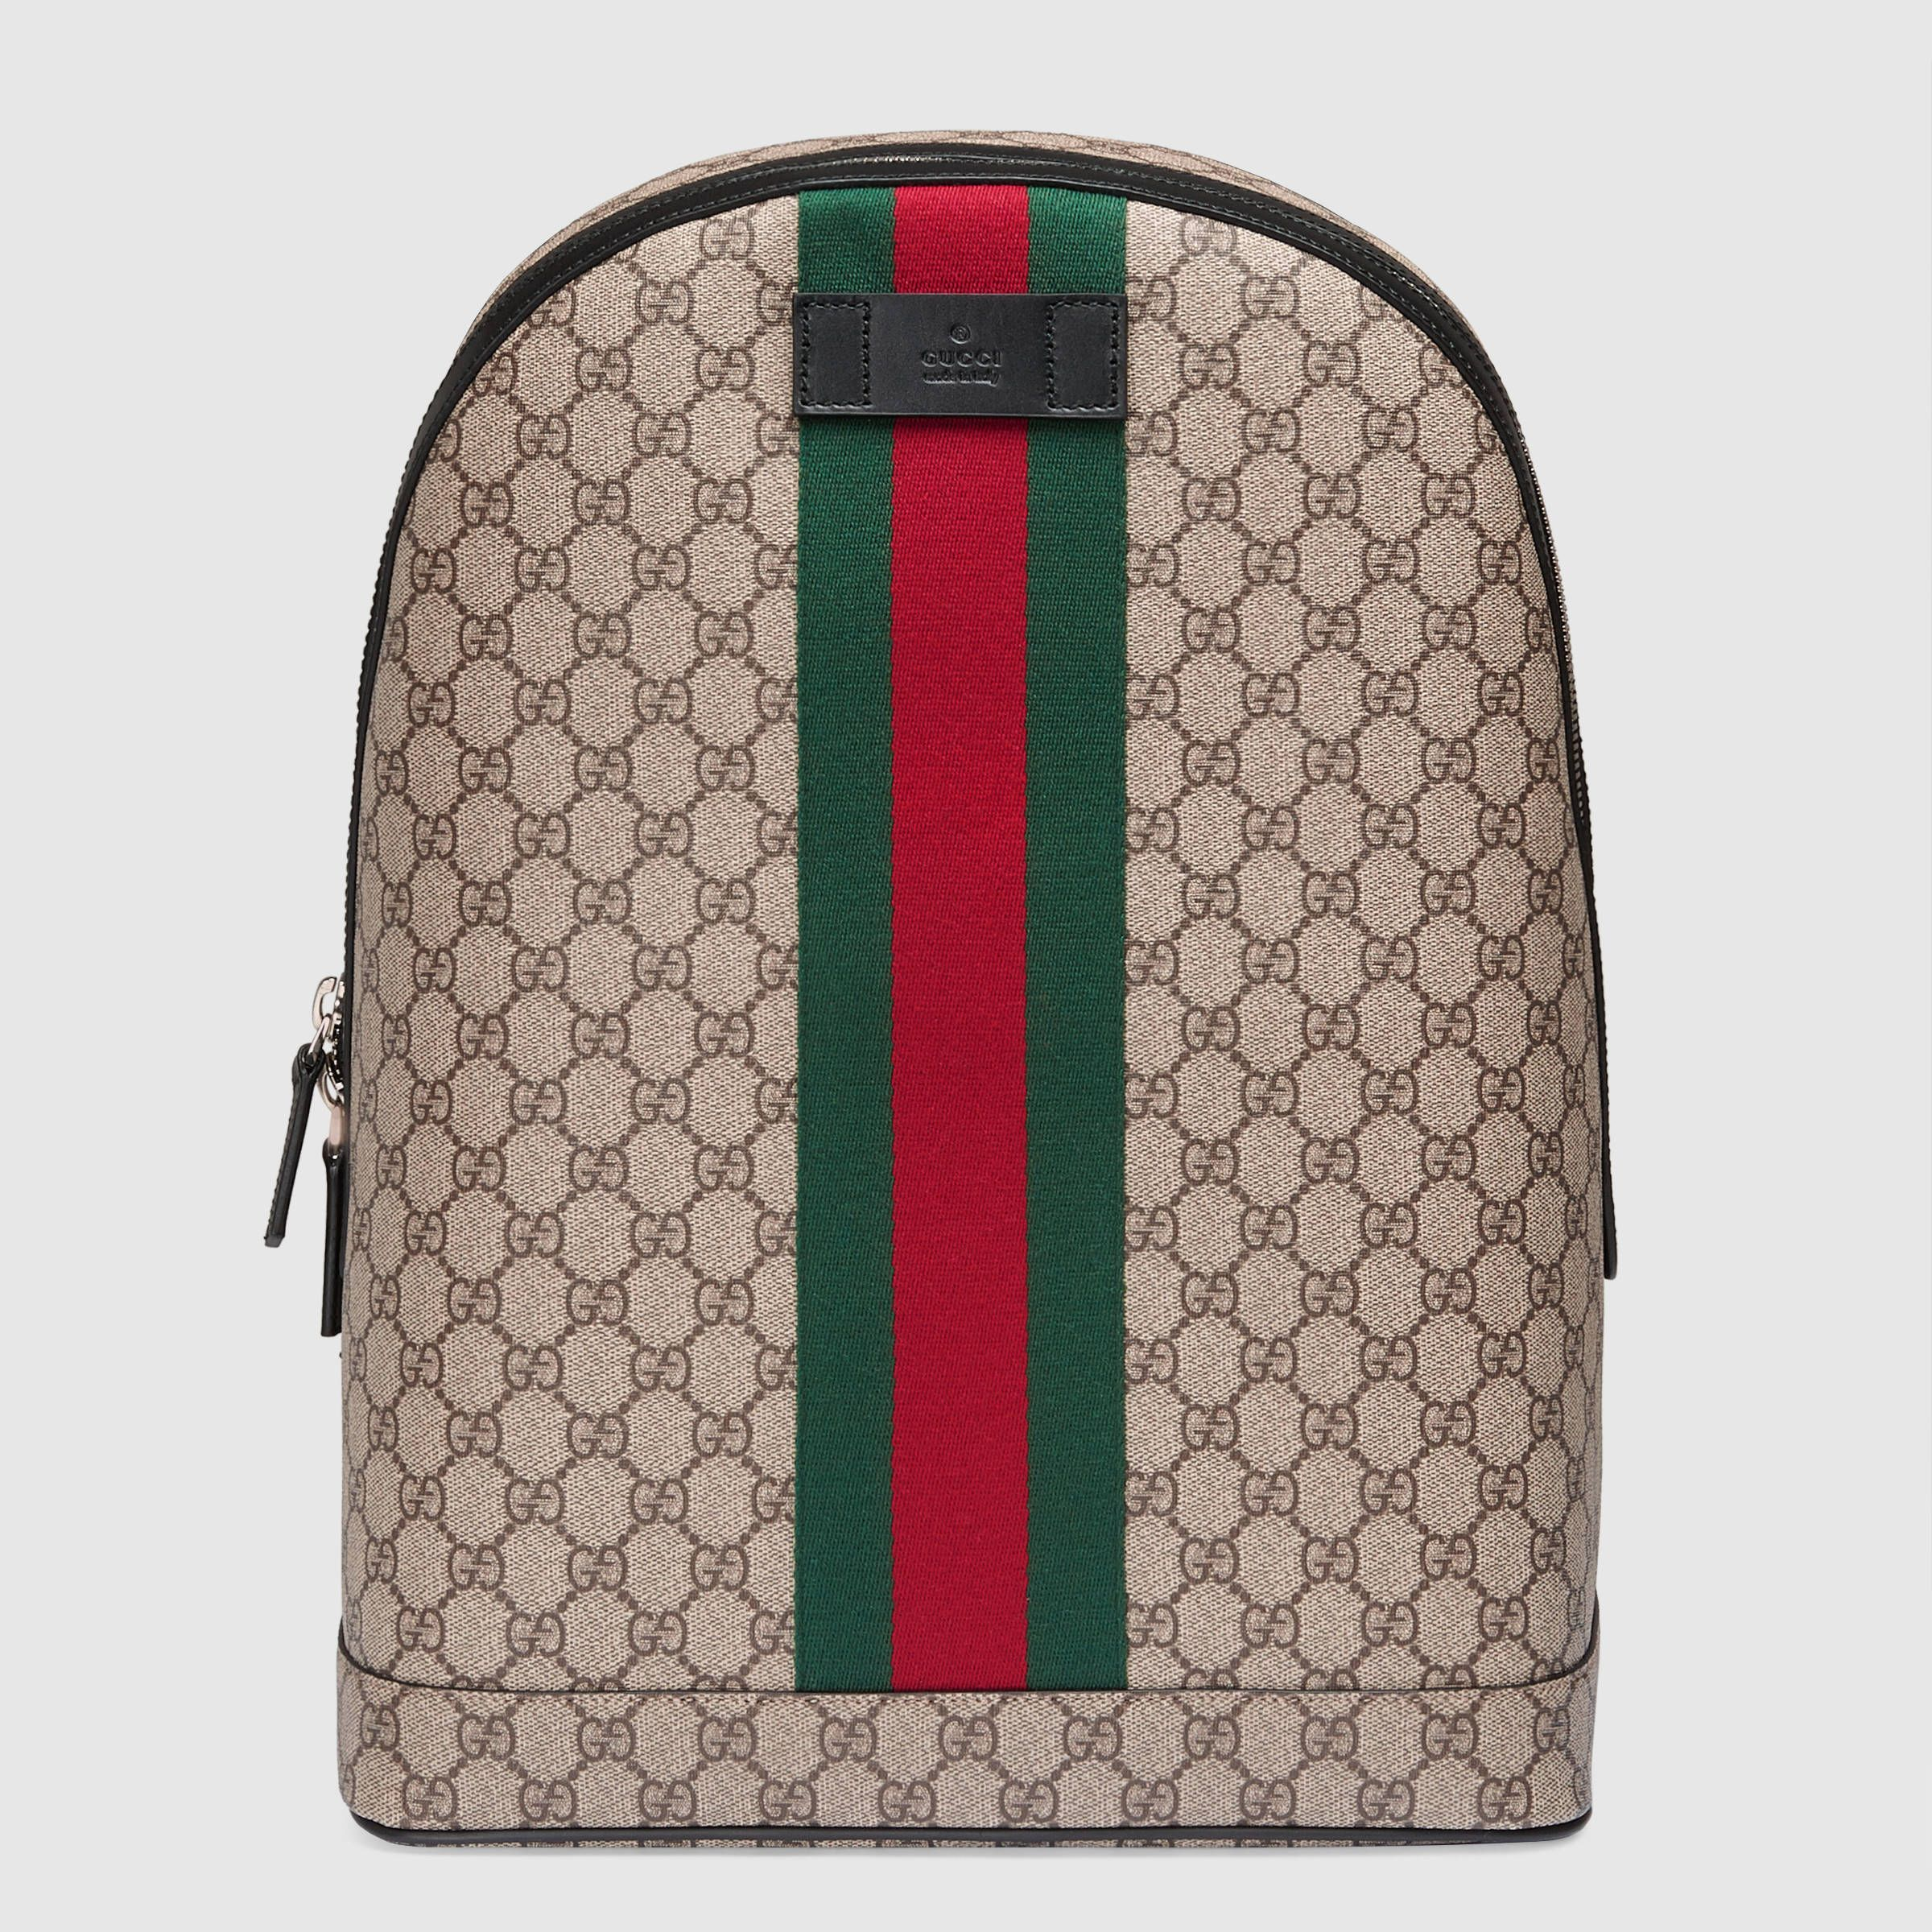 c9016bf0a7d9 Gucci Men - GG Supreme backpack with Web - 442722K2LVN9692 ...